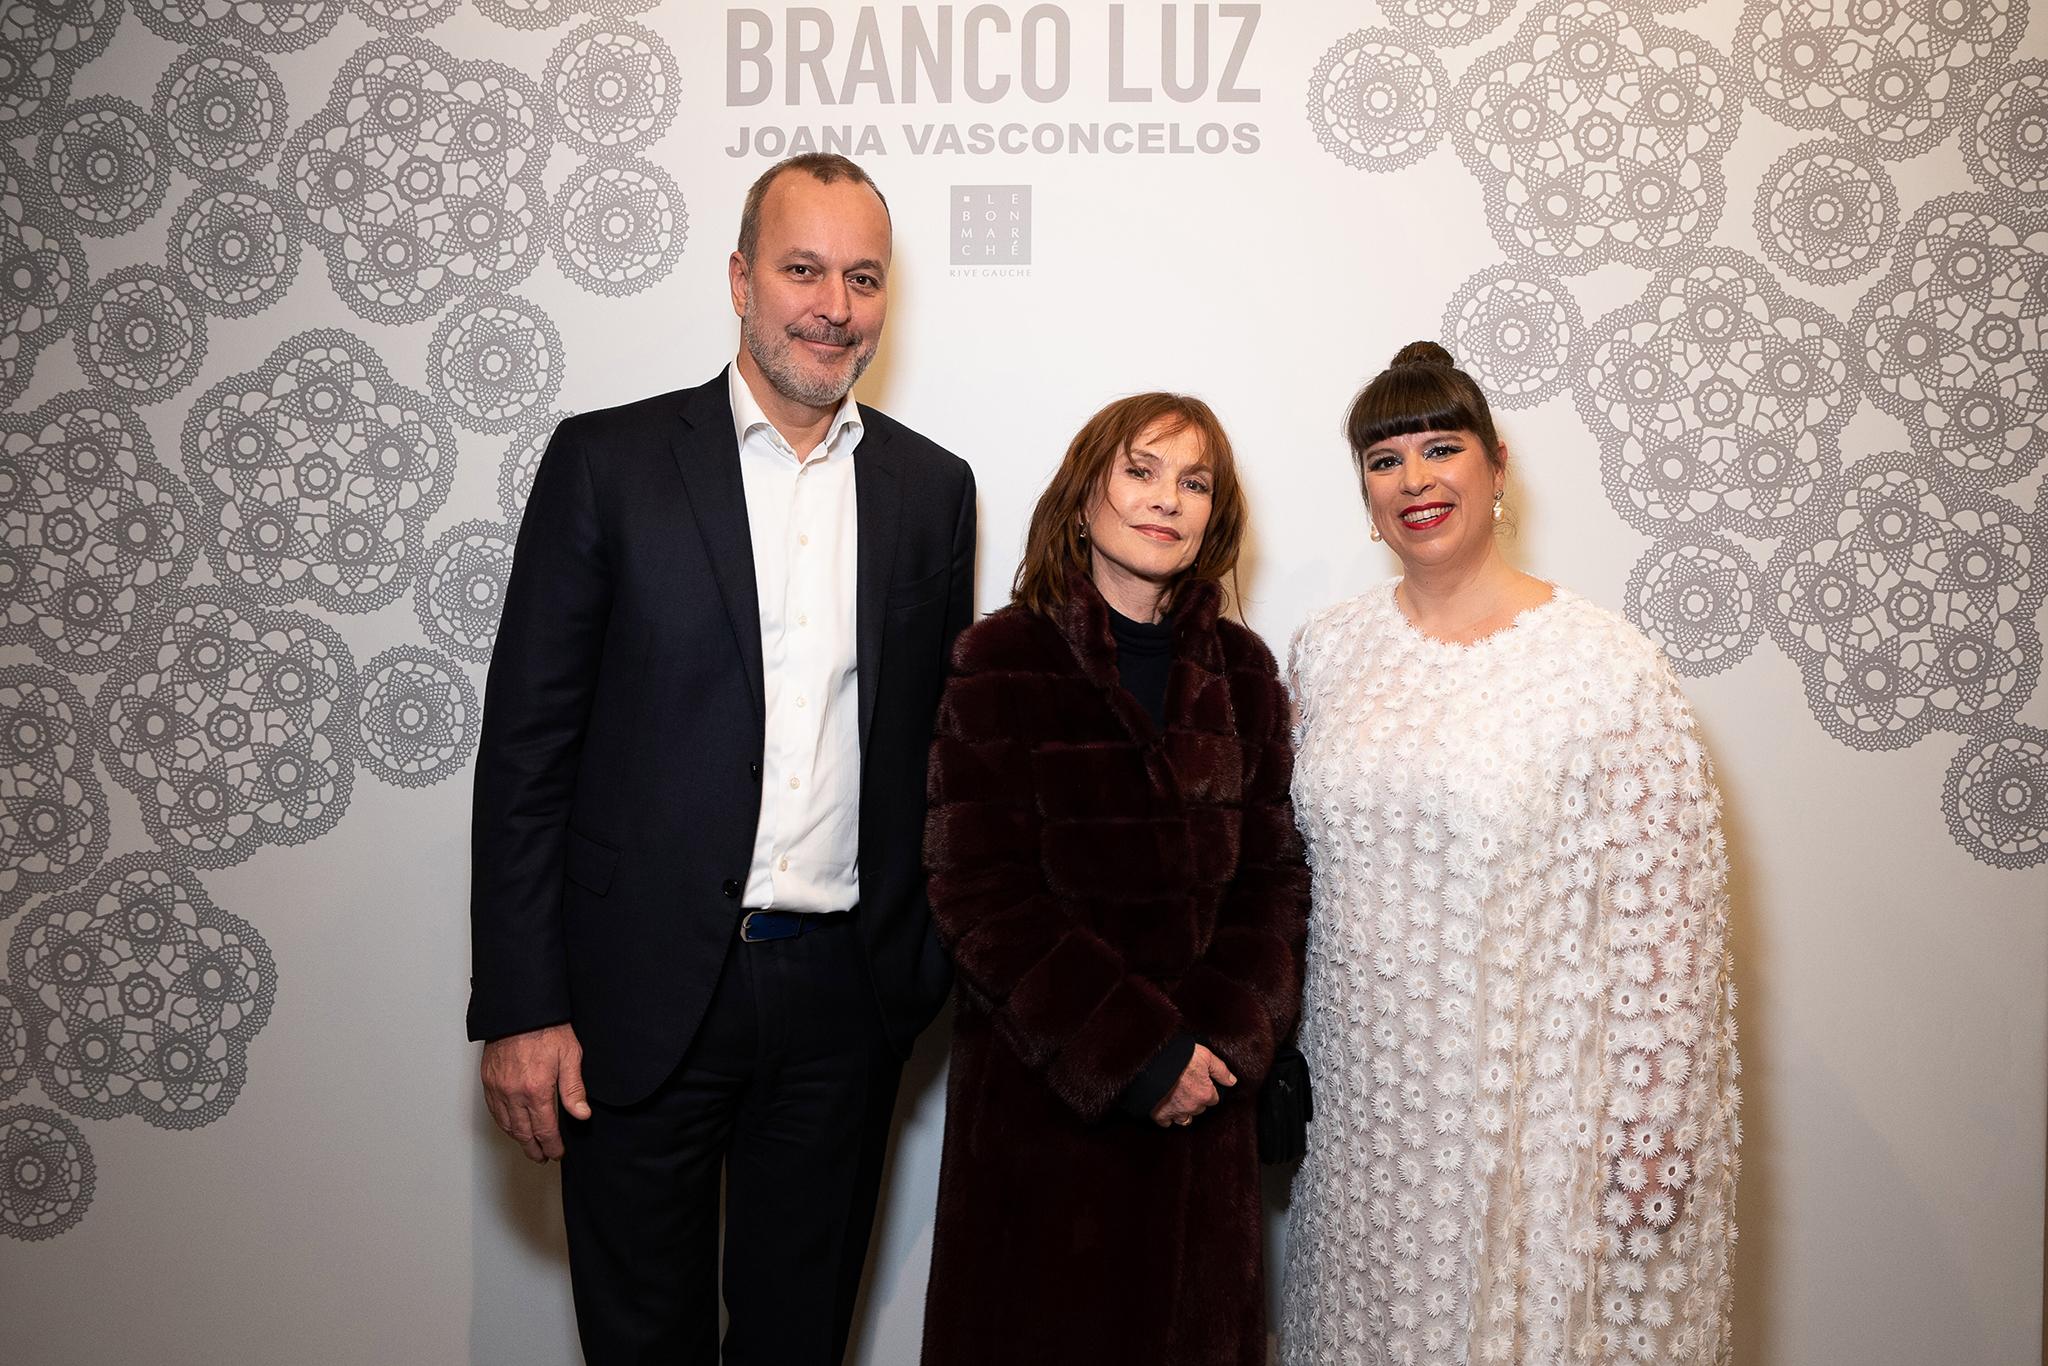 Patrice Wagner, Isabelle Huppert and  Joana Vasconcelos